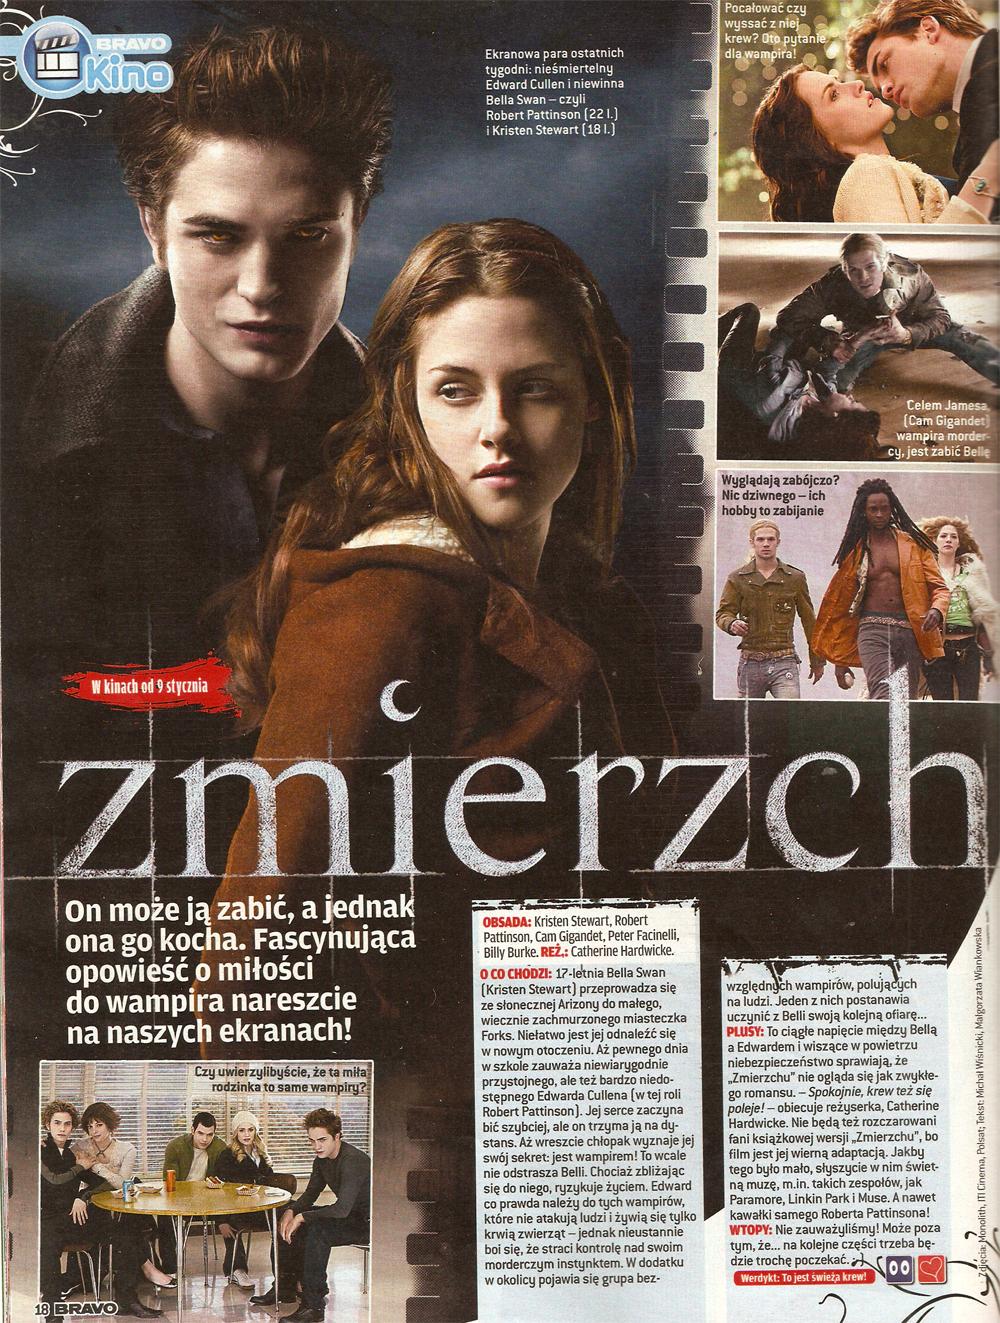 Twilight in Bravo 2009 (Poland)